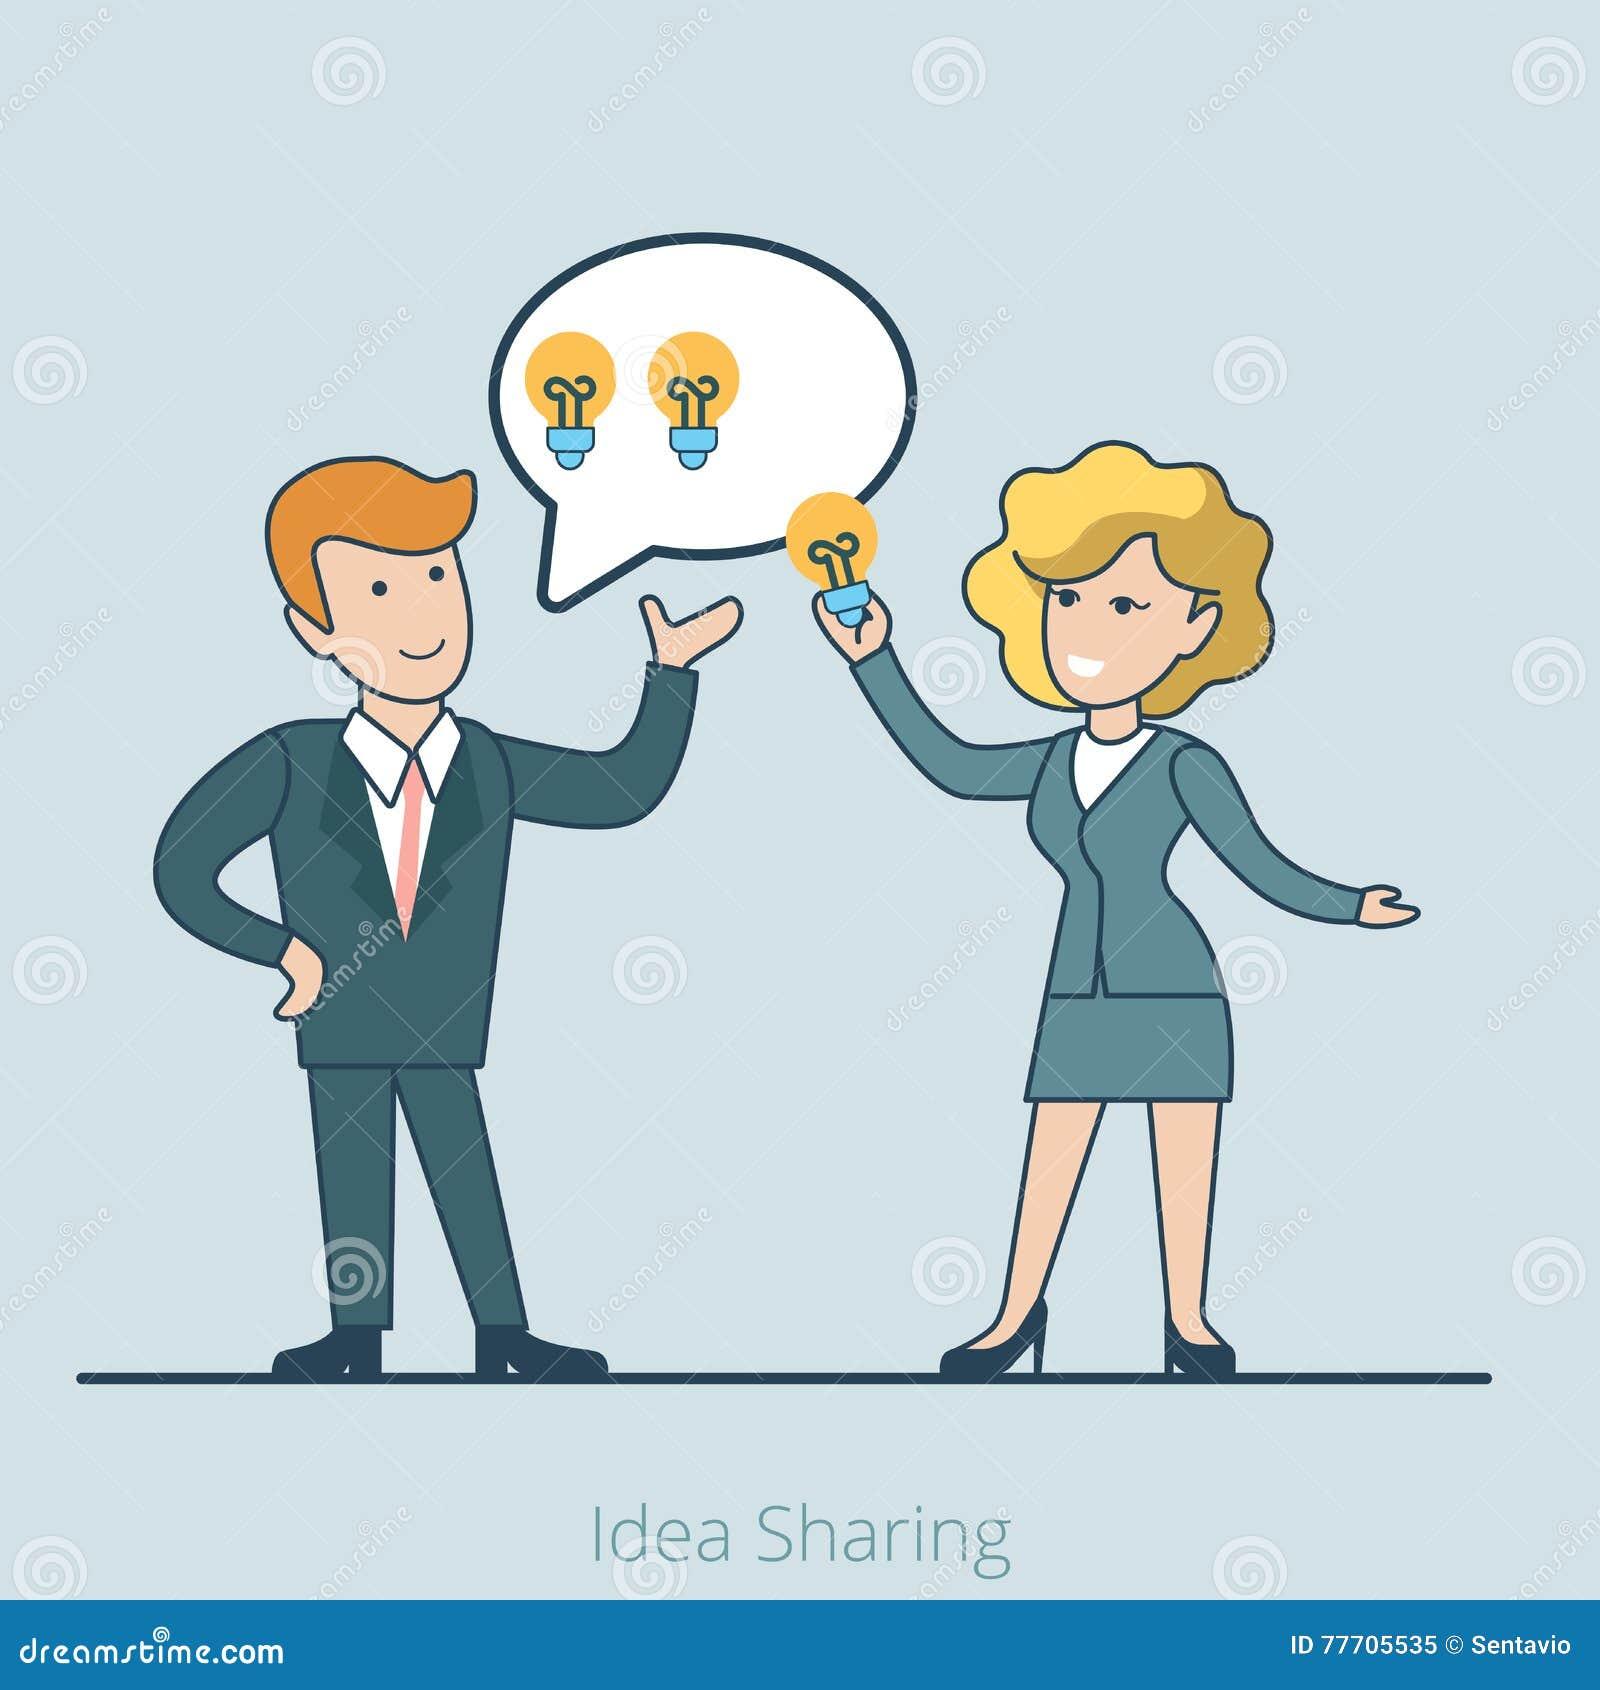 Idea plana linear del negocio que comparte a la gente IL